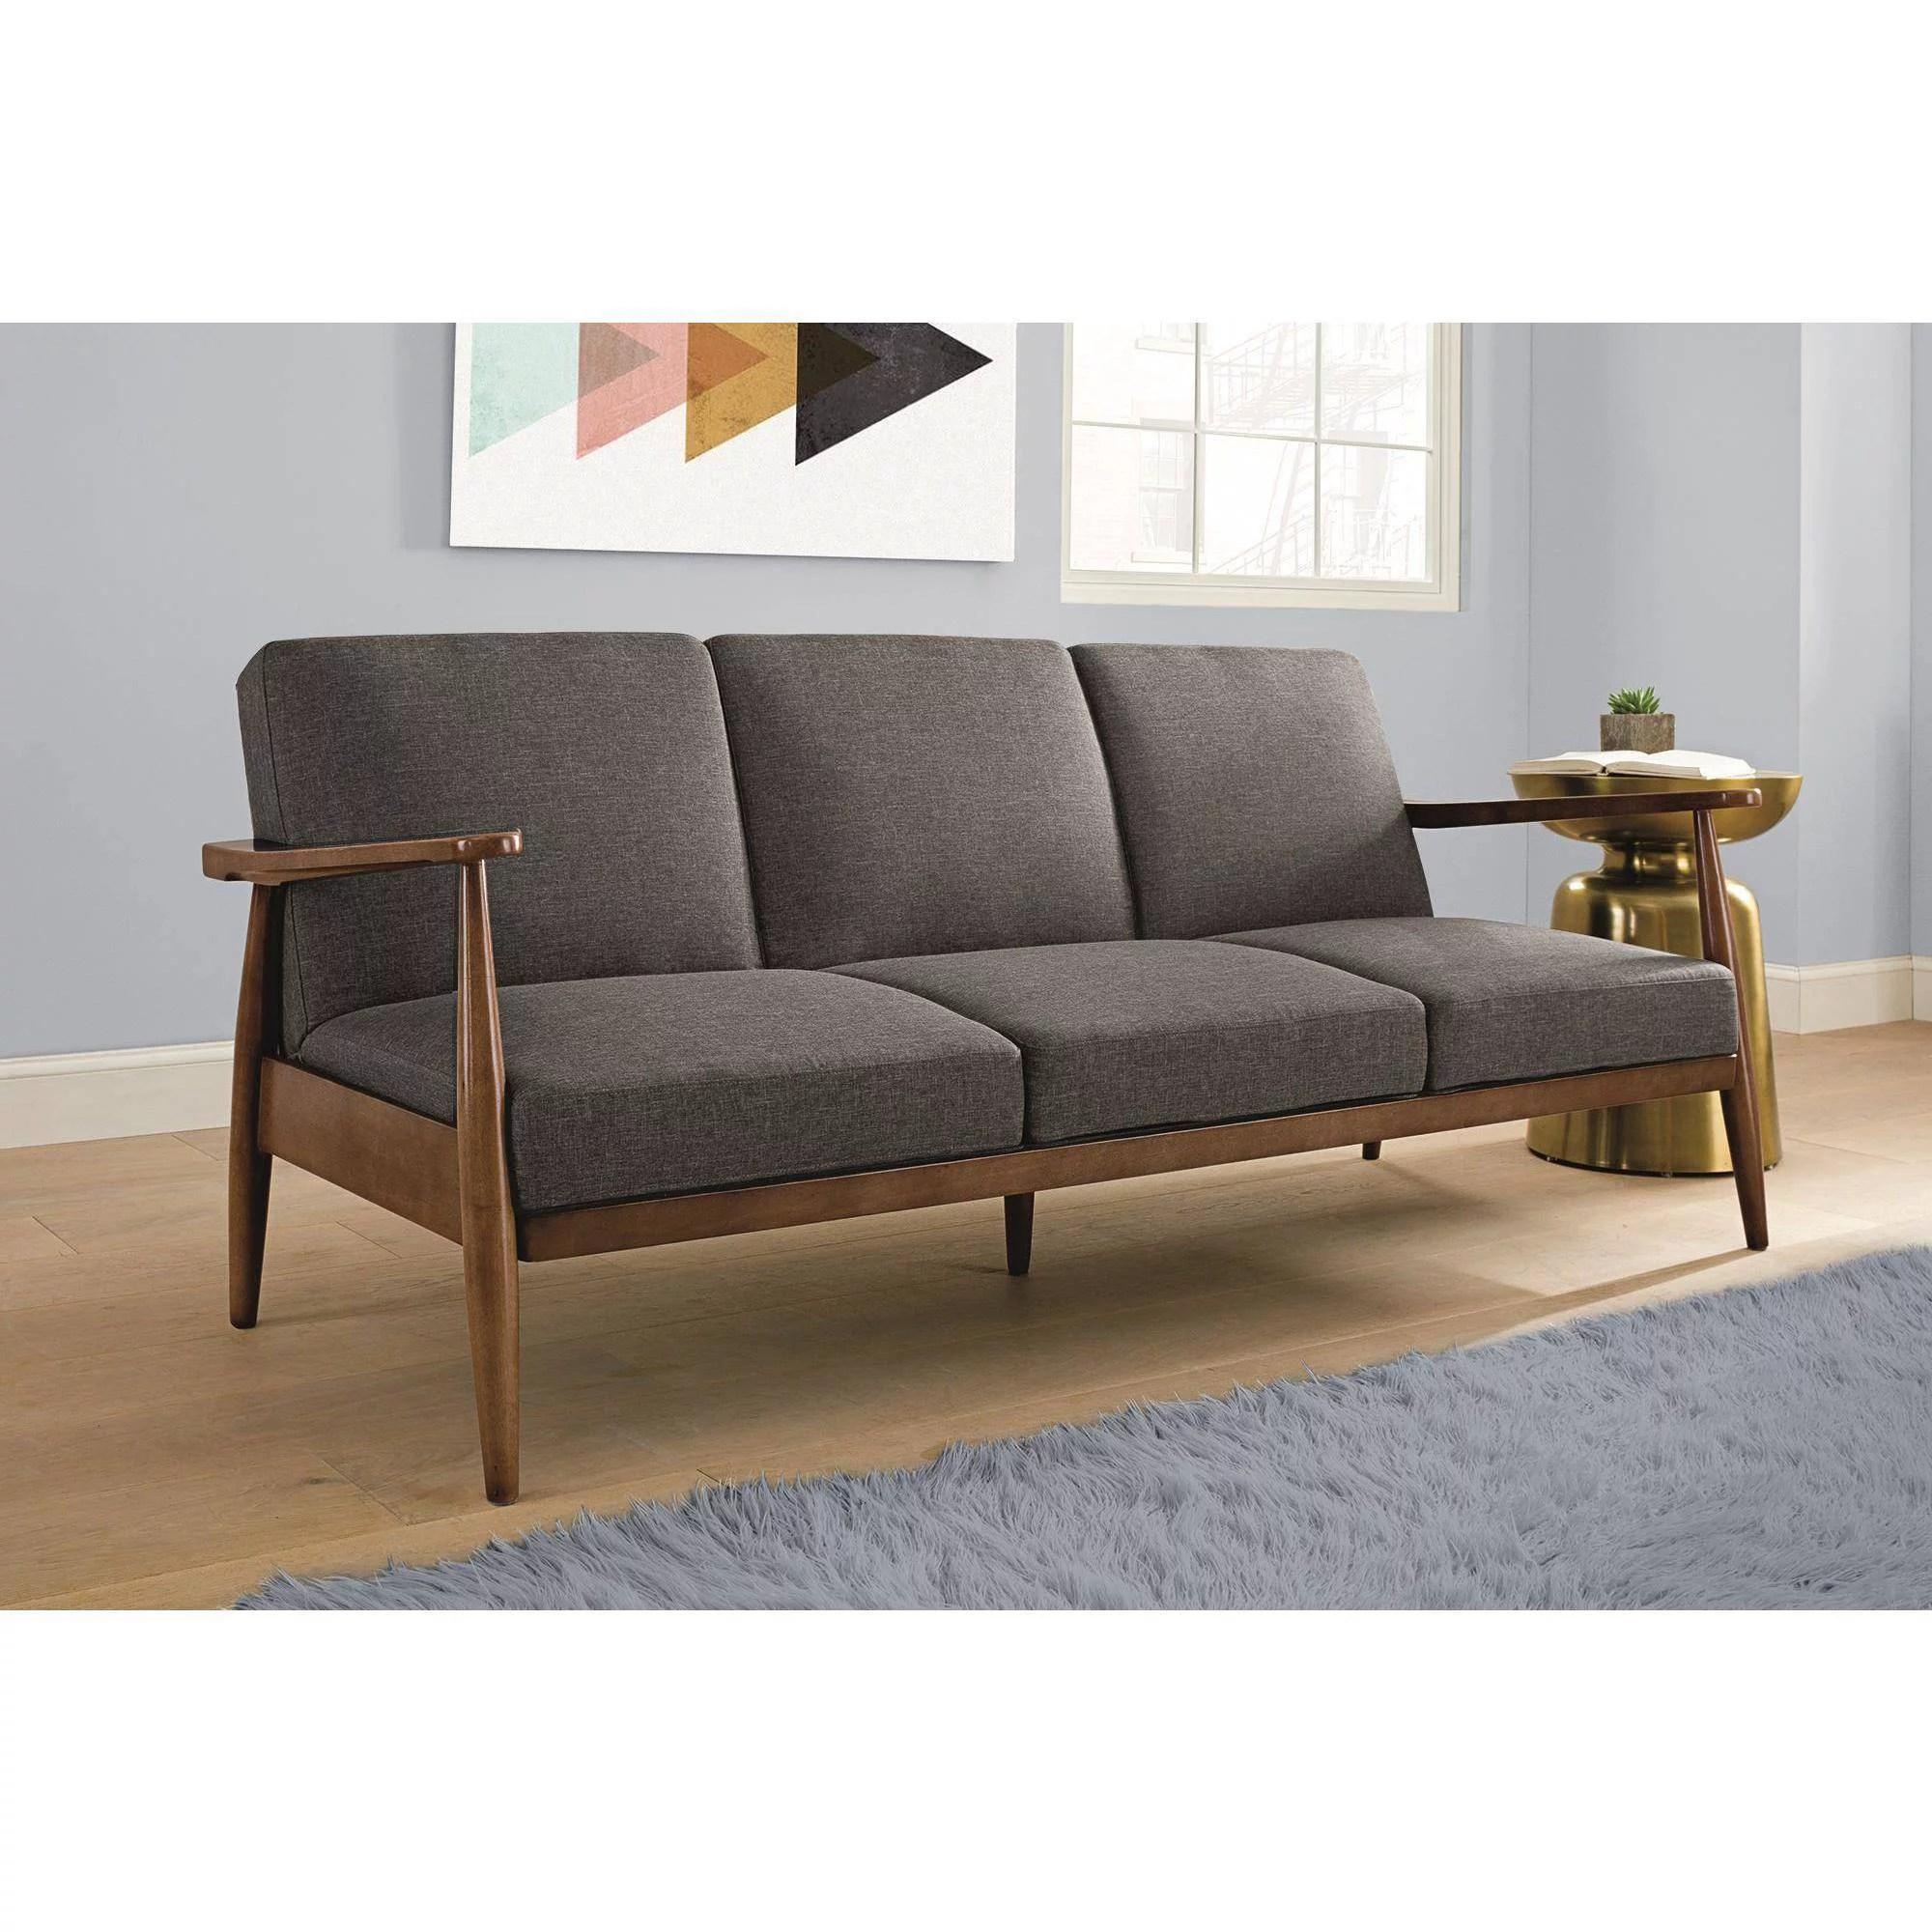 Better Homes And Gardens Flynn Mid Century Sofa Bed Multiple Colors Walmart Com Walmart Com